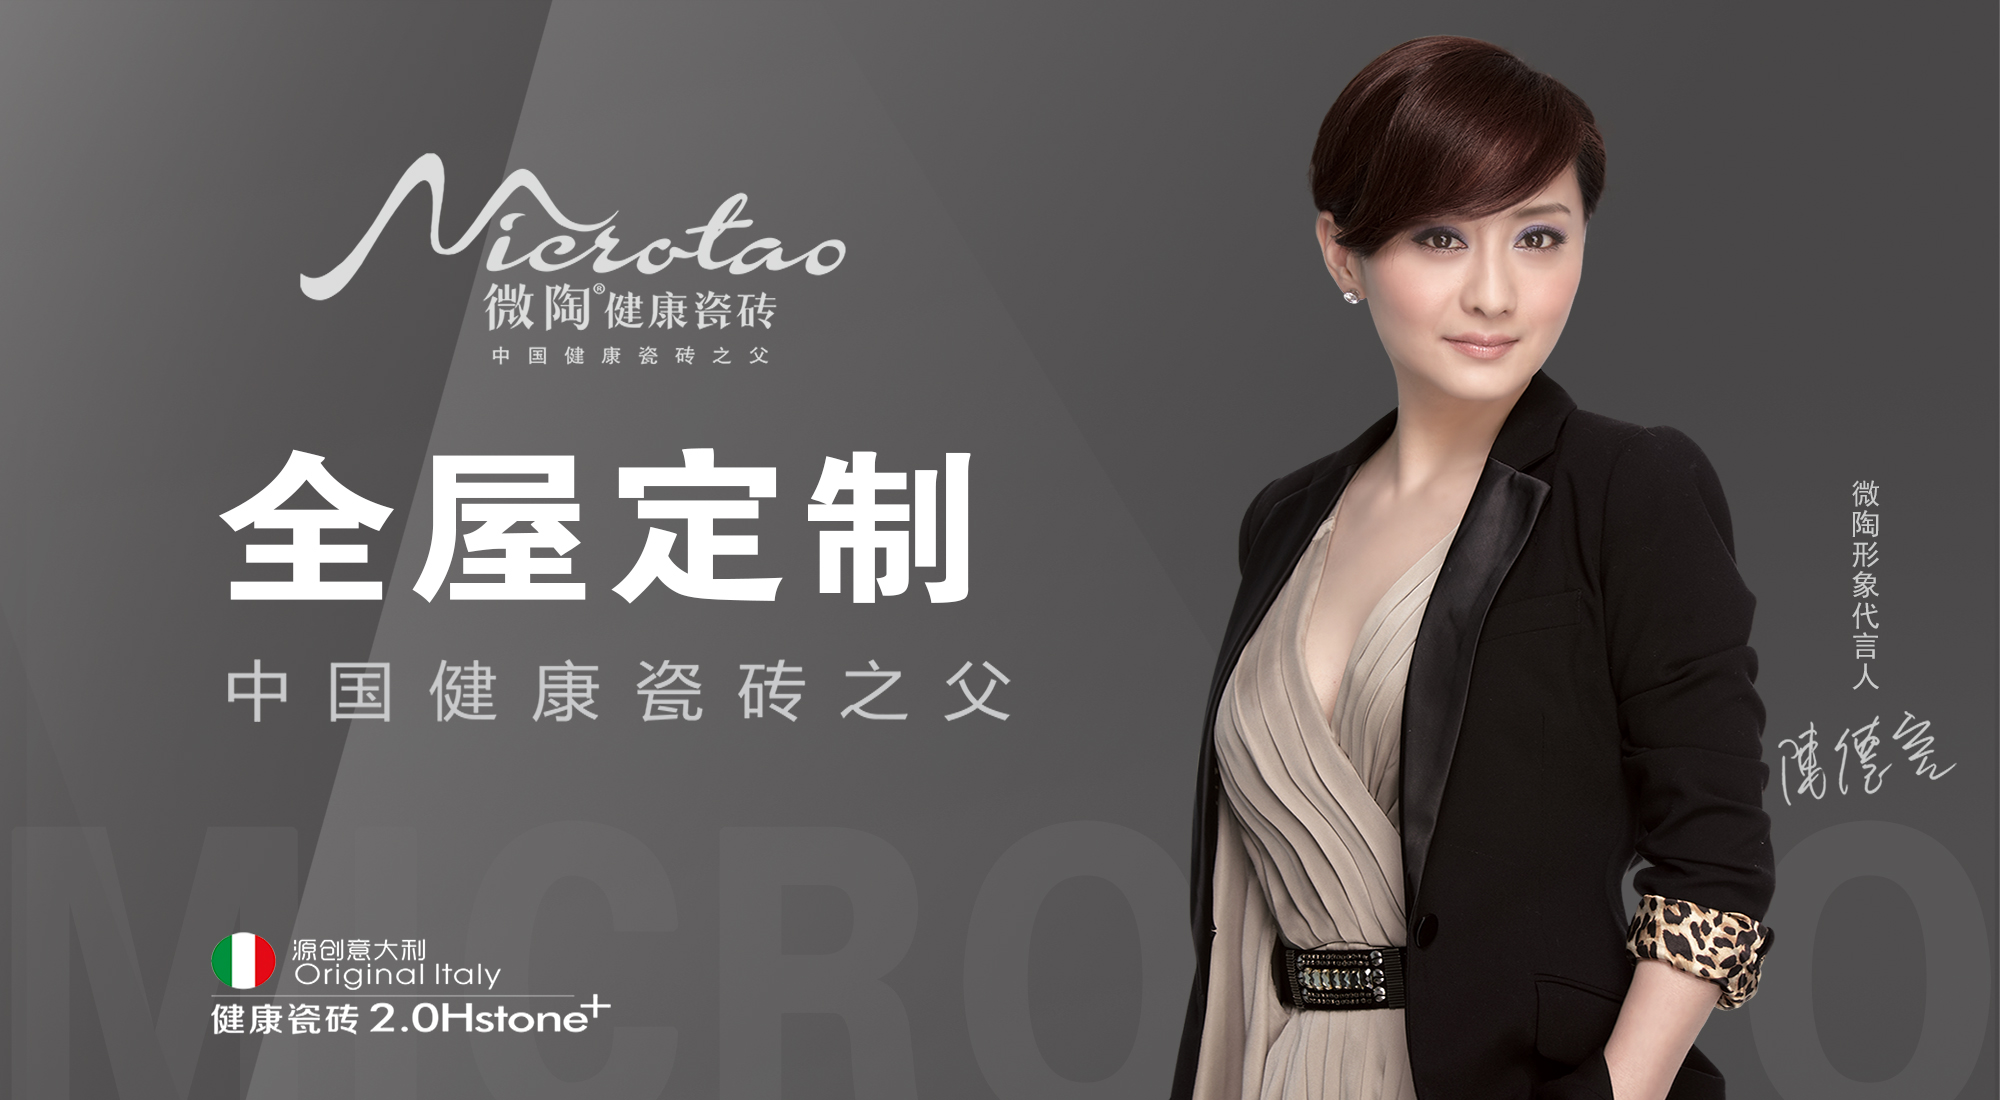 http://ename.hk.ymsm.cc/weitaotaoci.com/img/2923.jpg